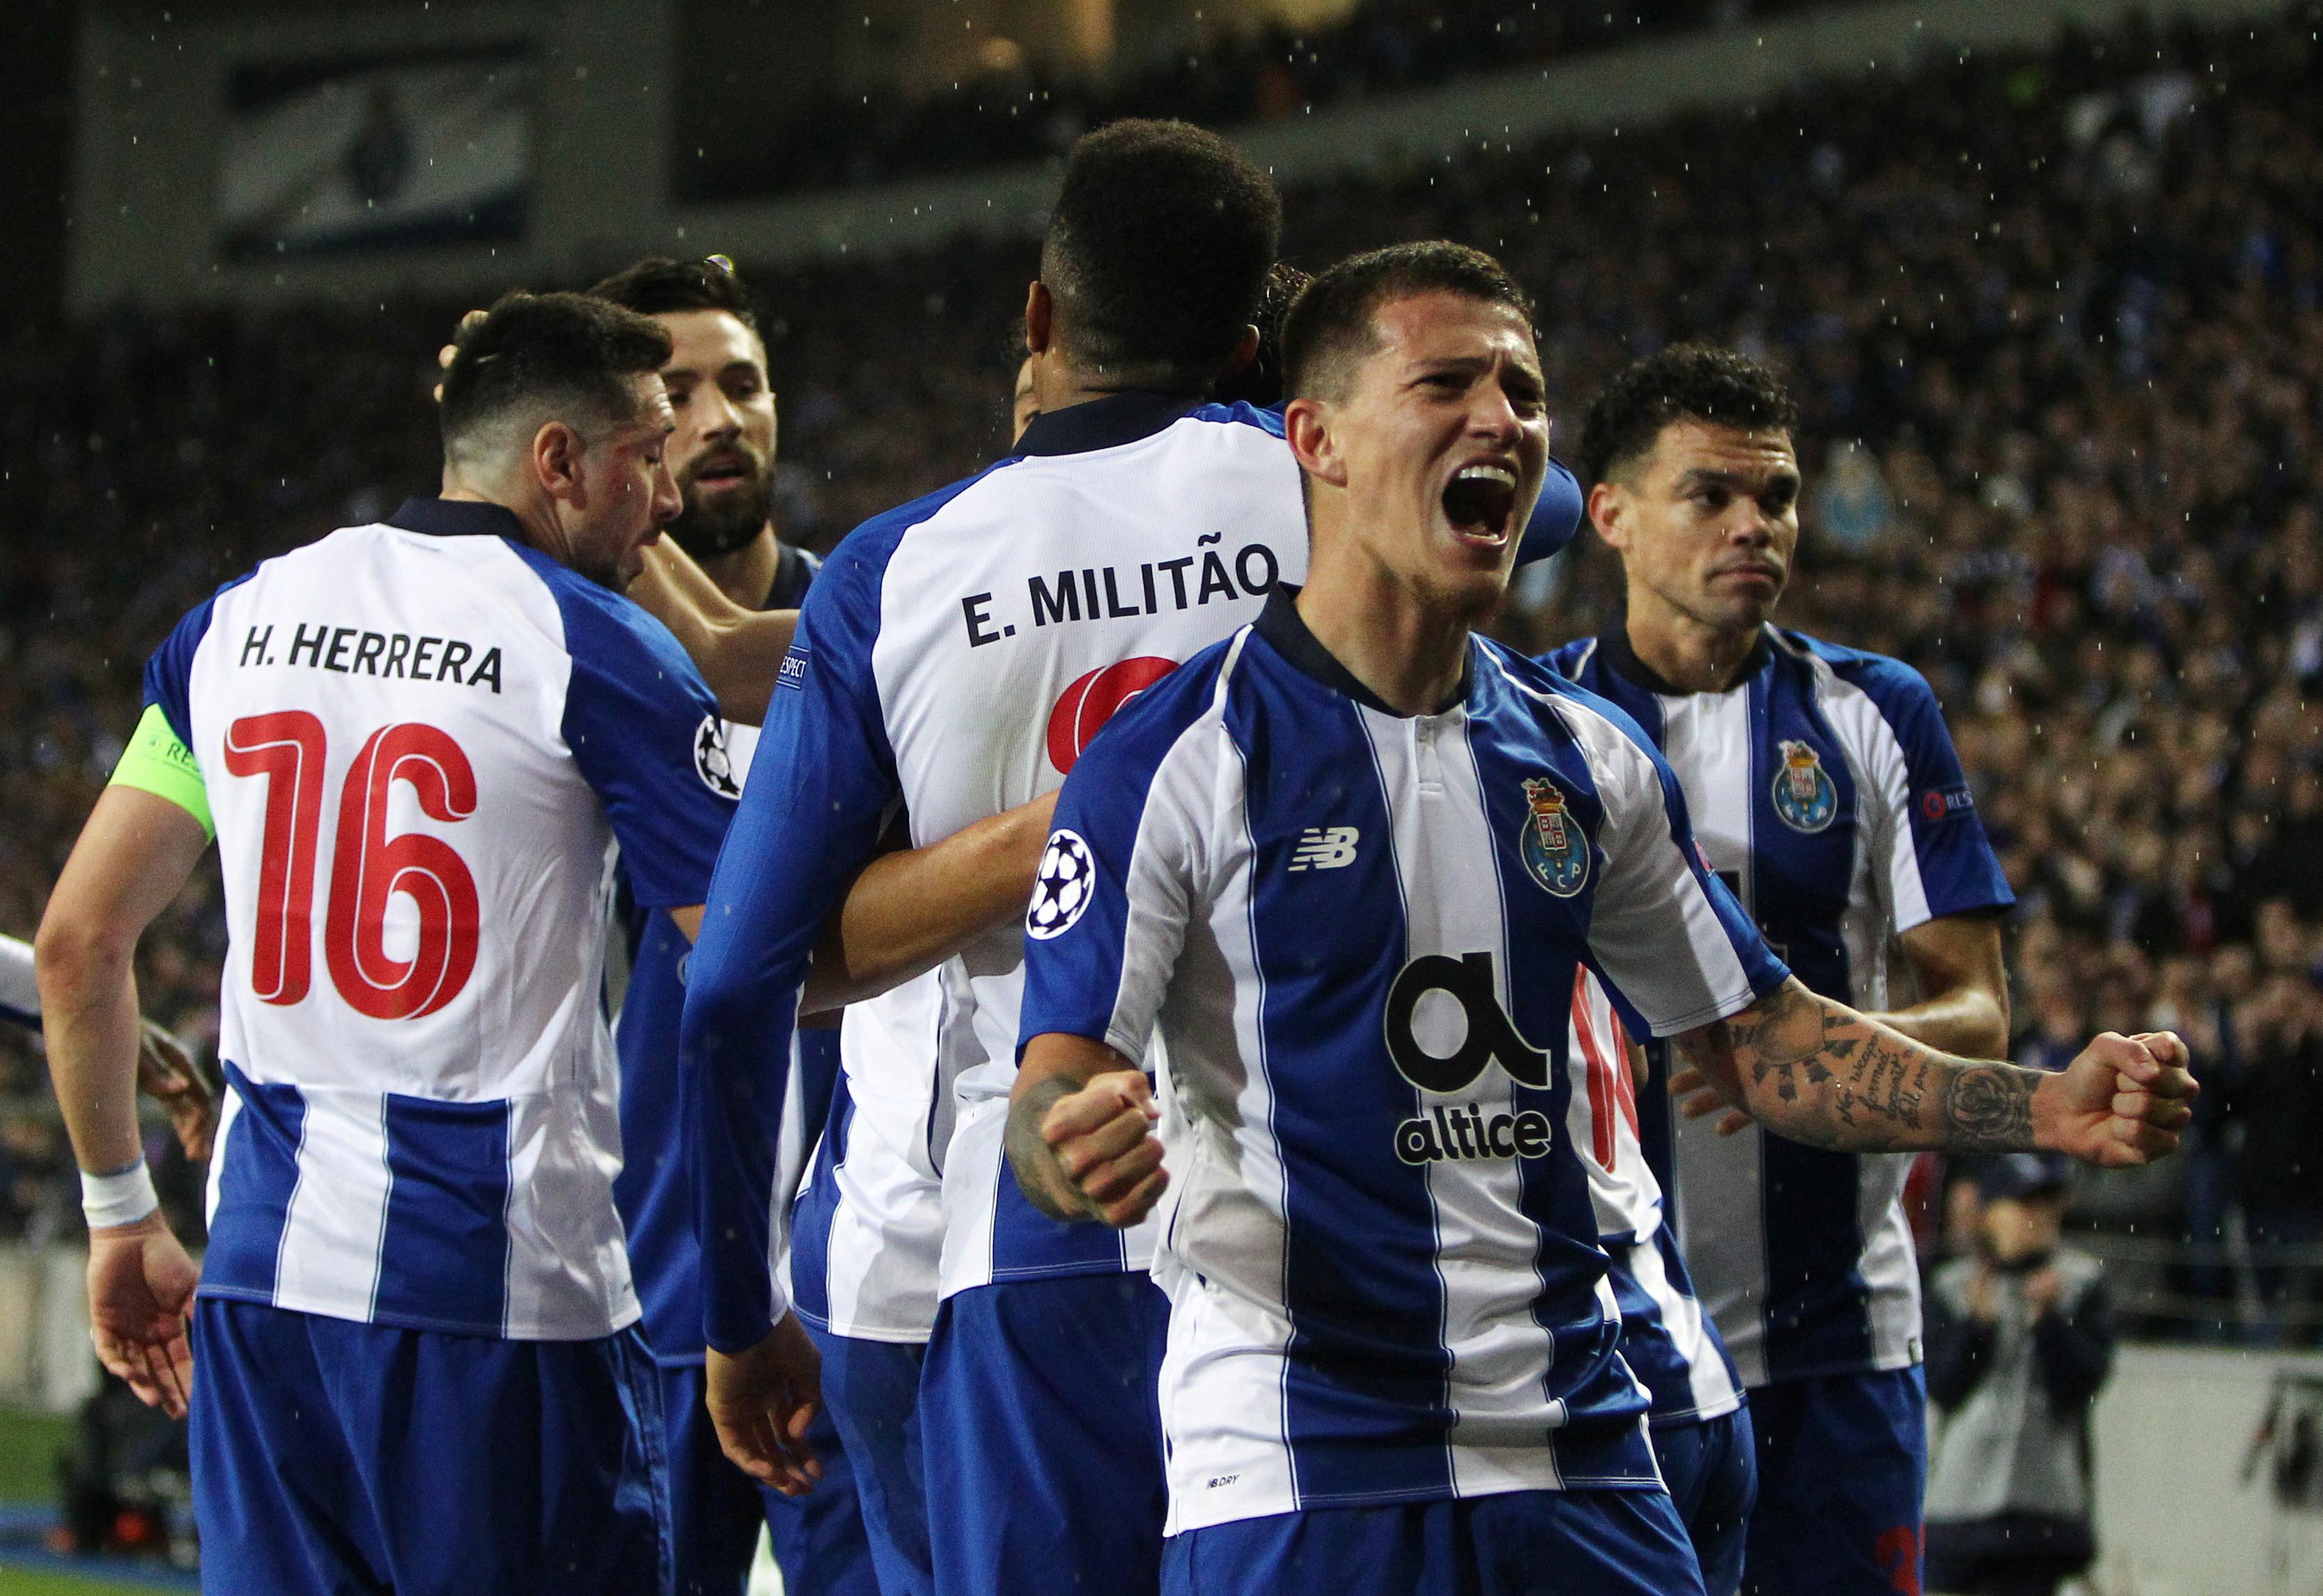 FC Porto lidera ranking da UEFA em 2018/19